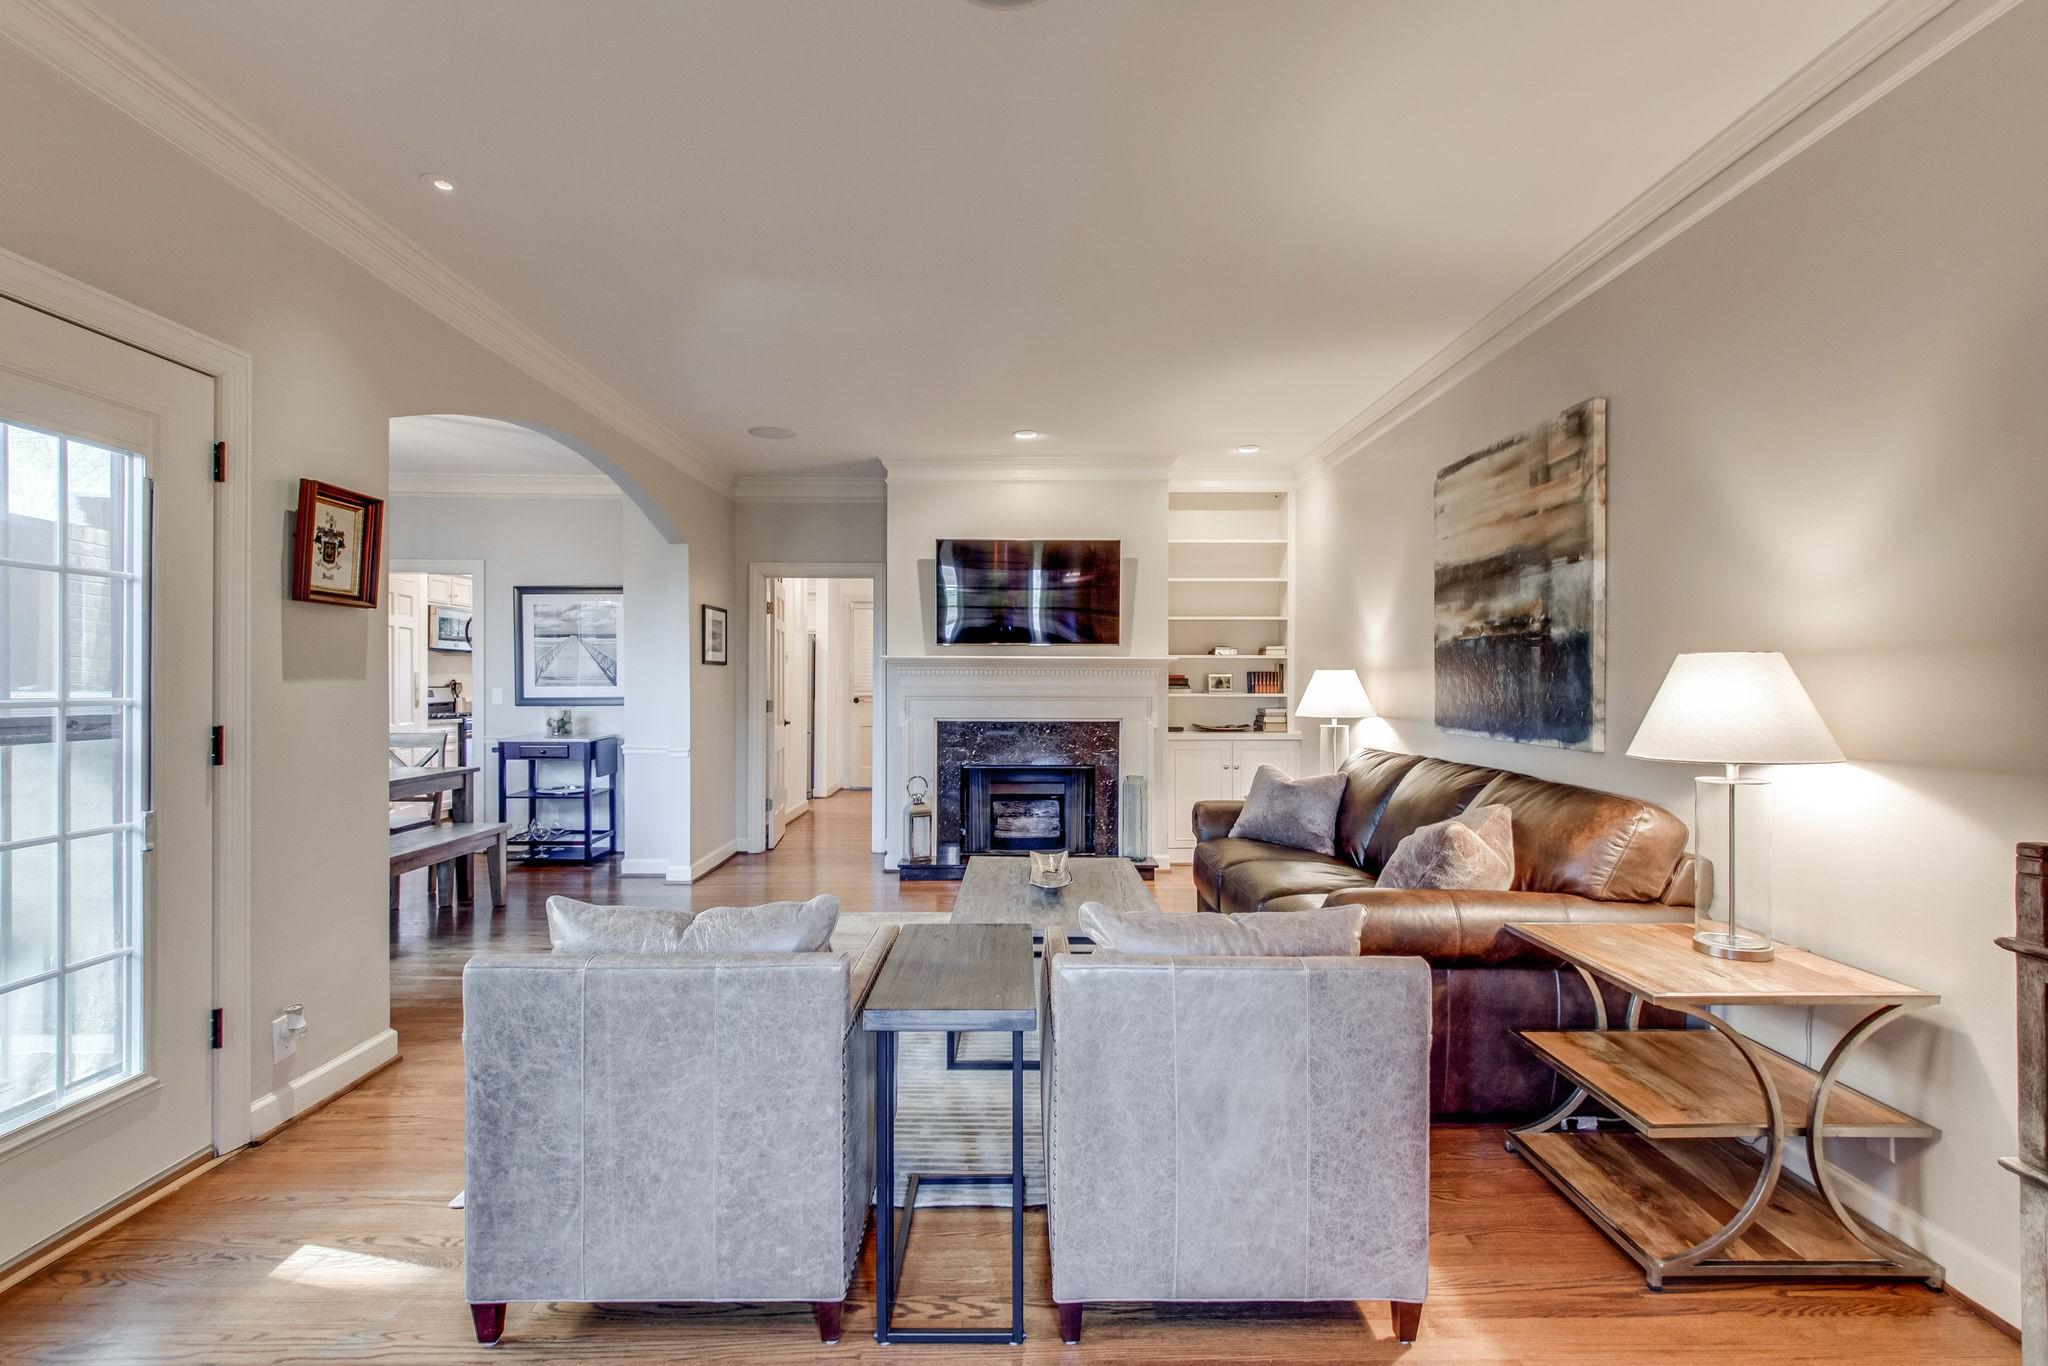 374 Elmington Ave, Nashville, TN 37205 - Nashville, TN real estate listing